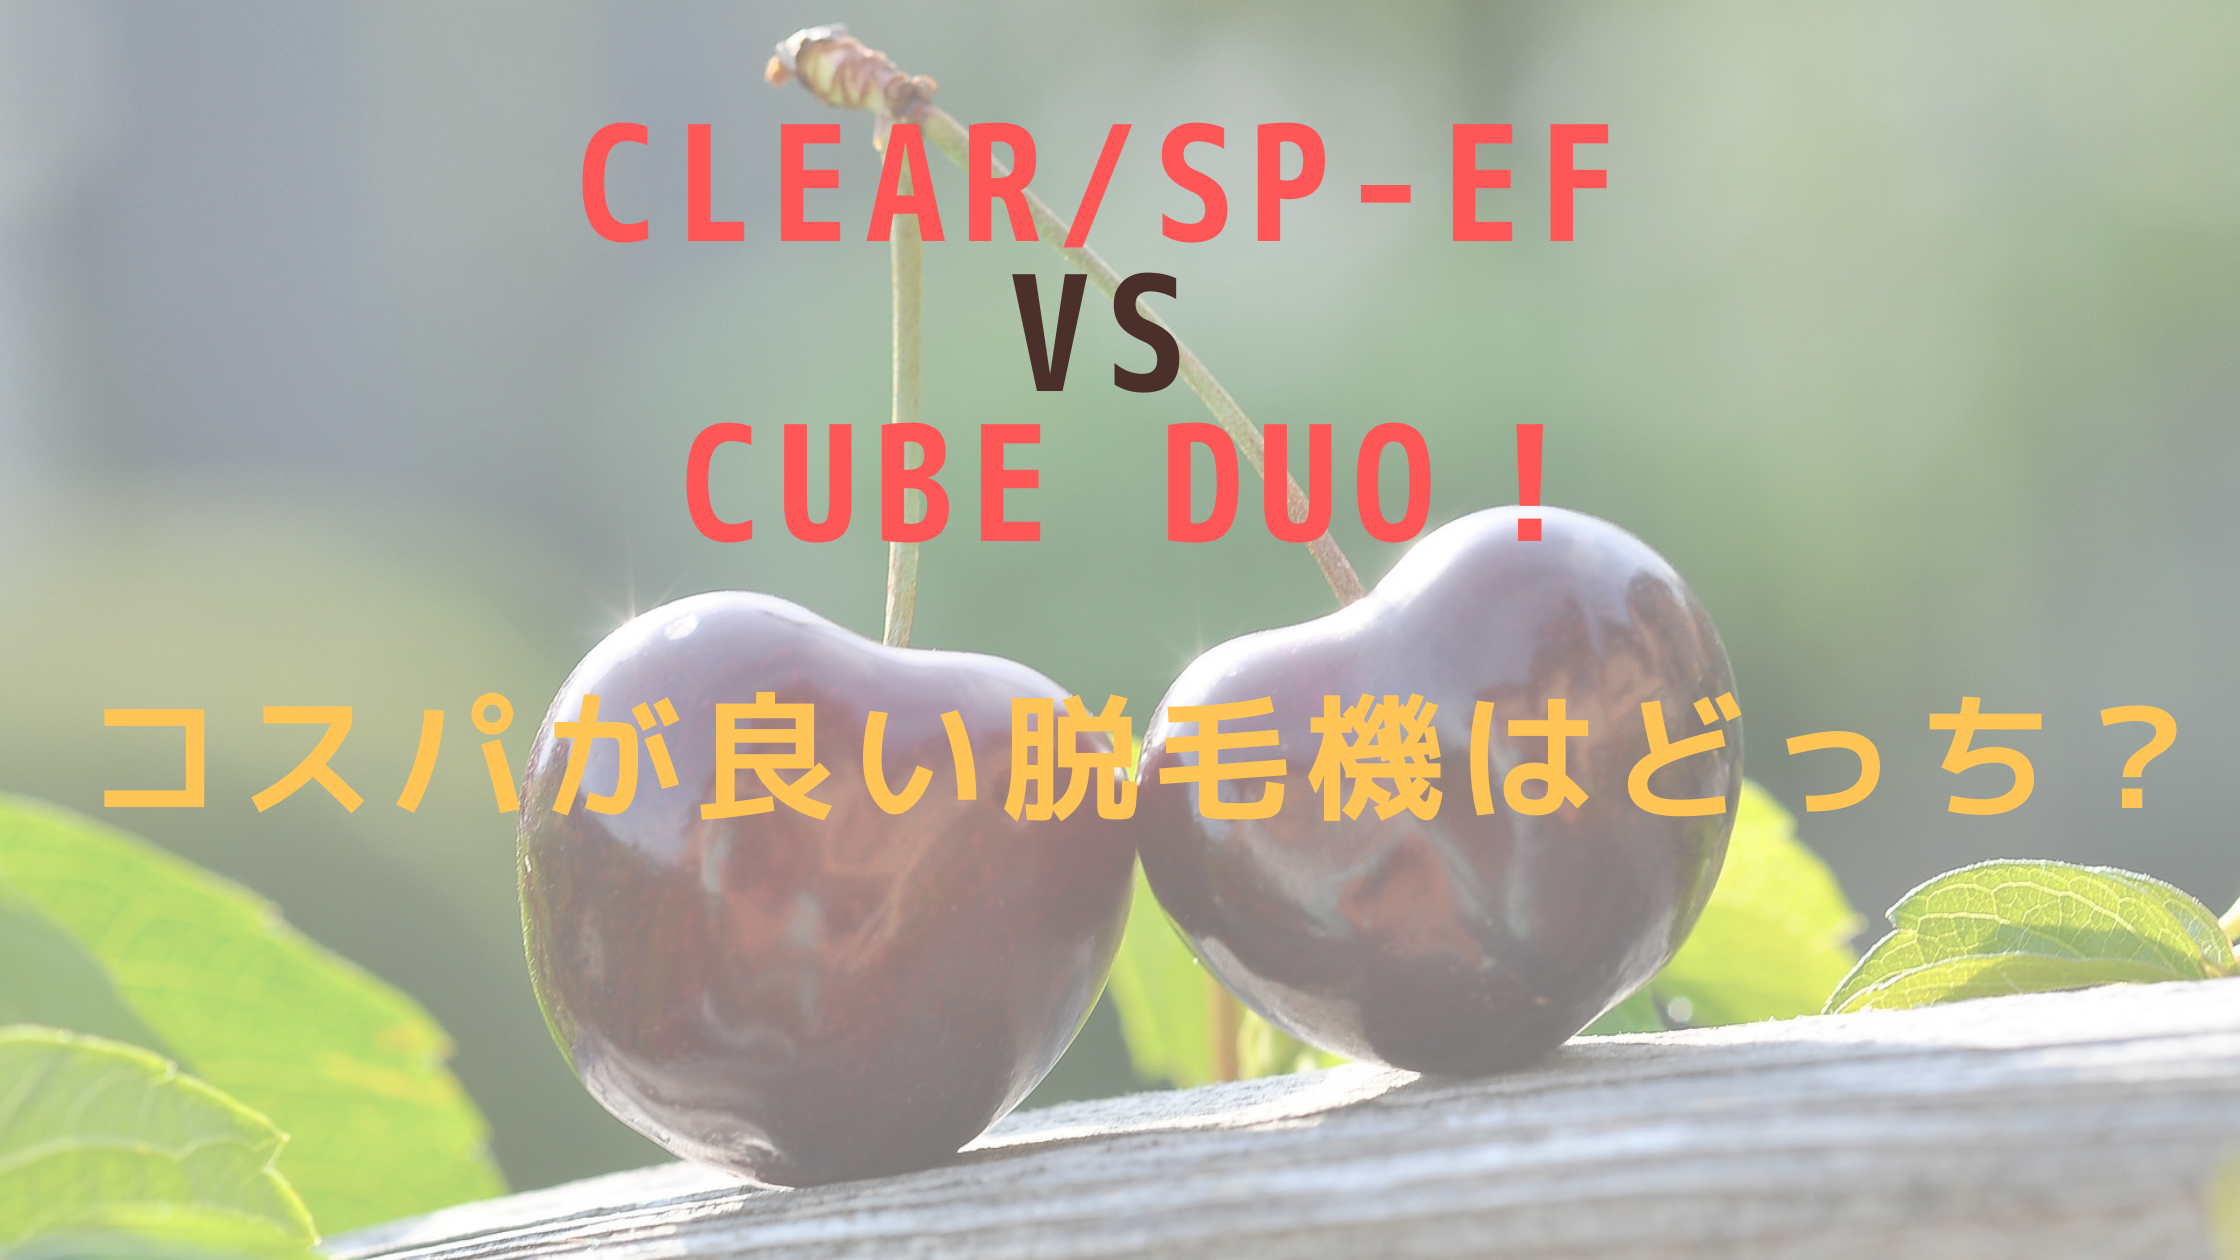 CLEAR/SP-ef VS CUBE DUO!コスパが良い脱毛機はどっち?